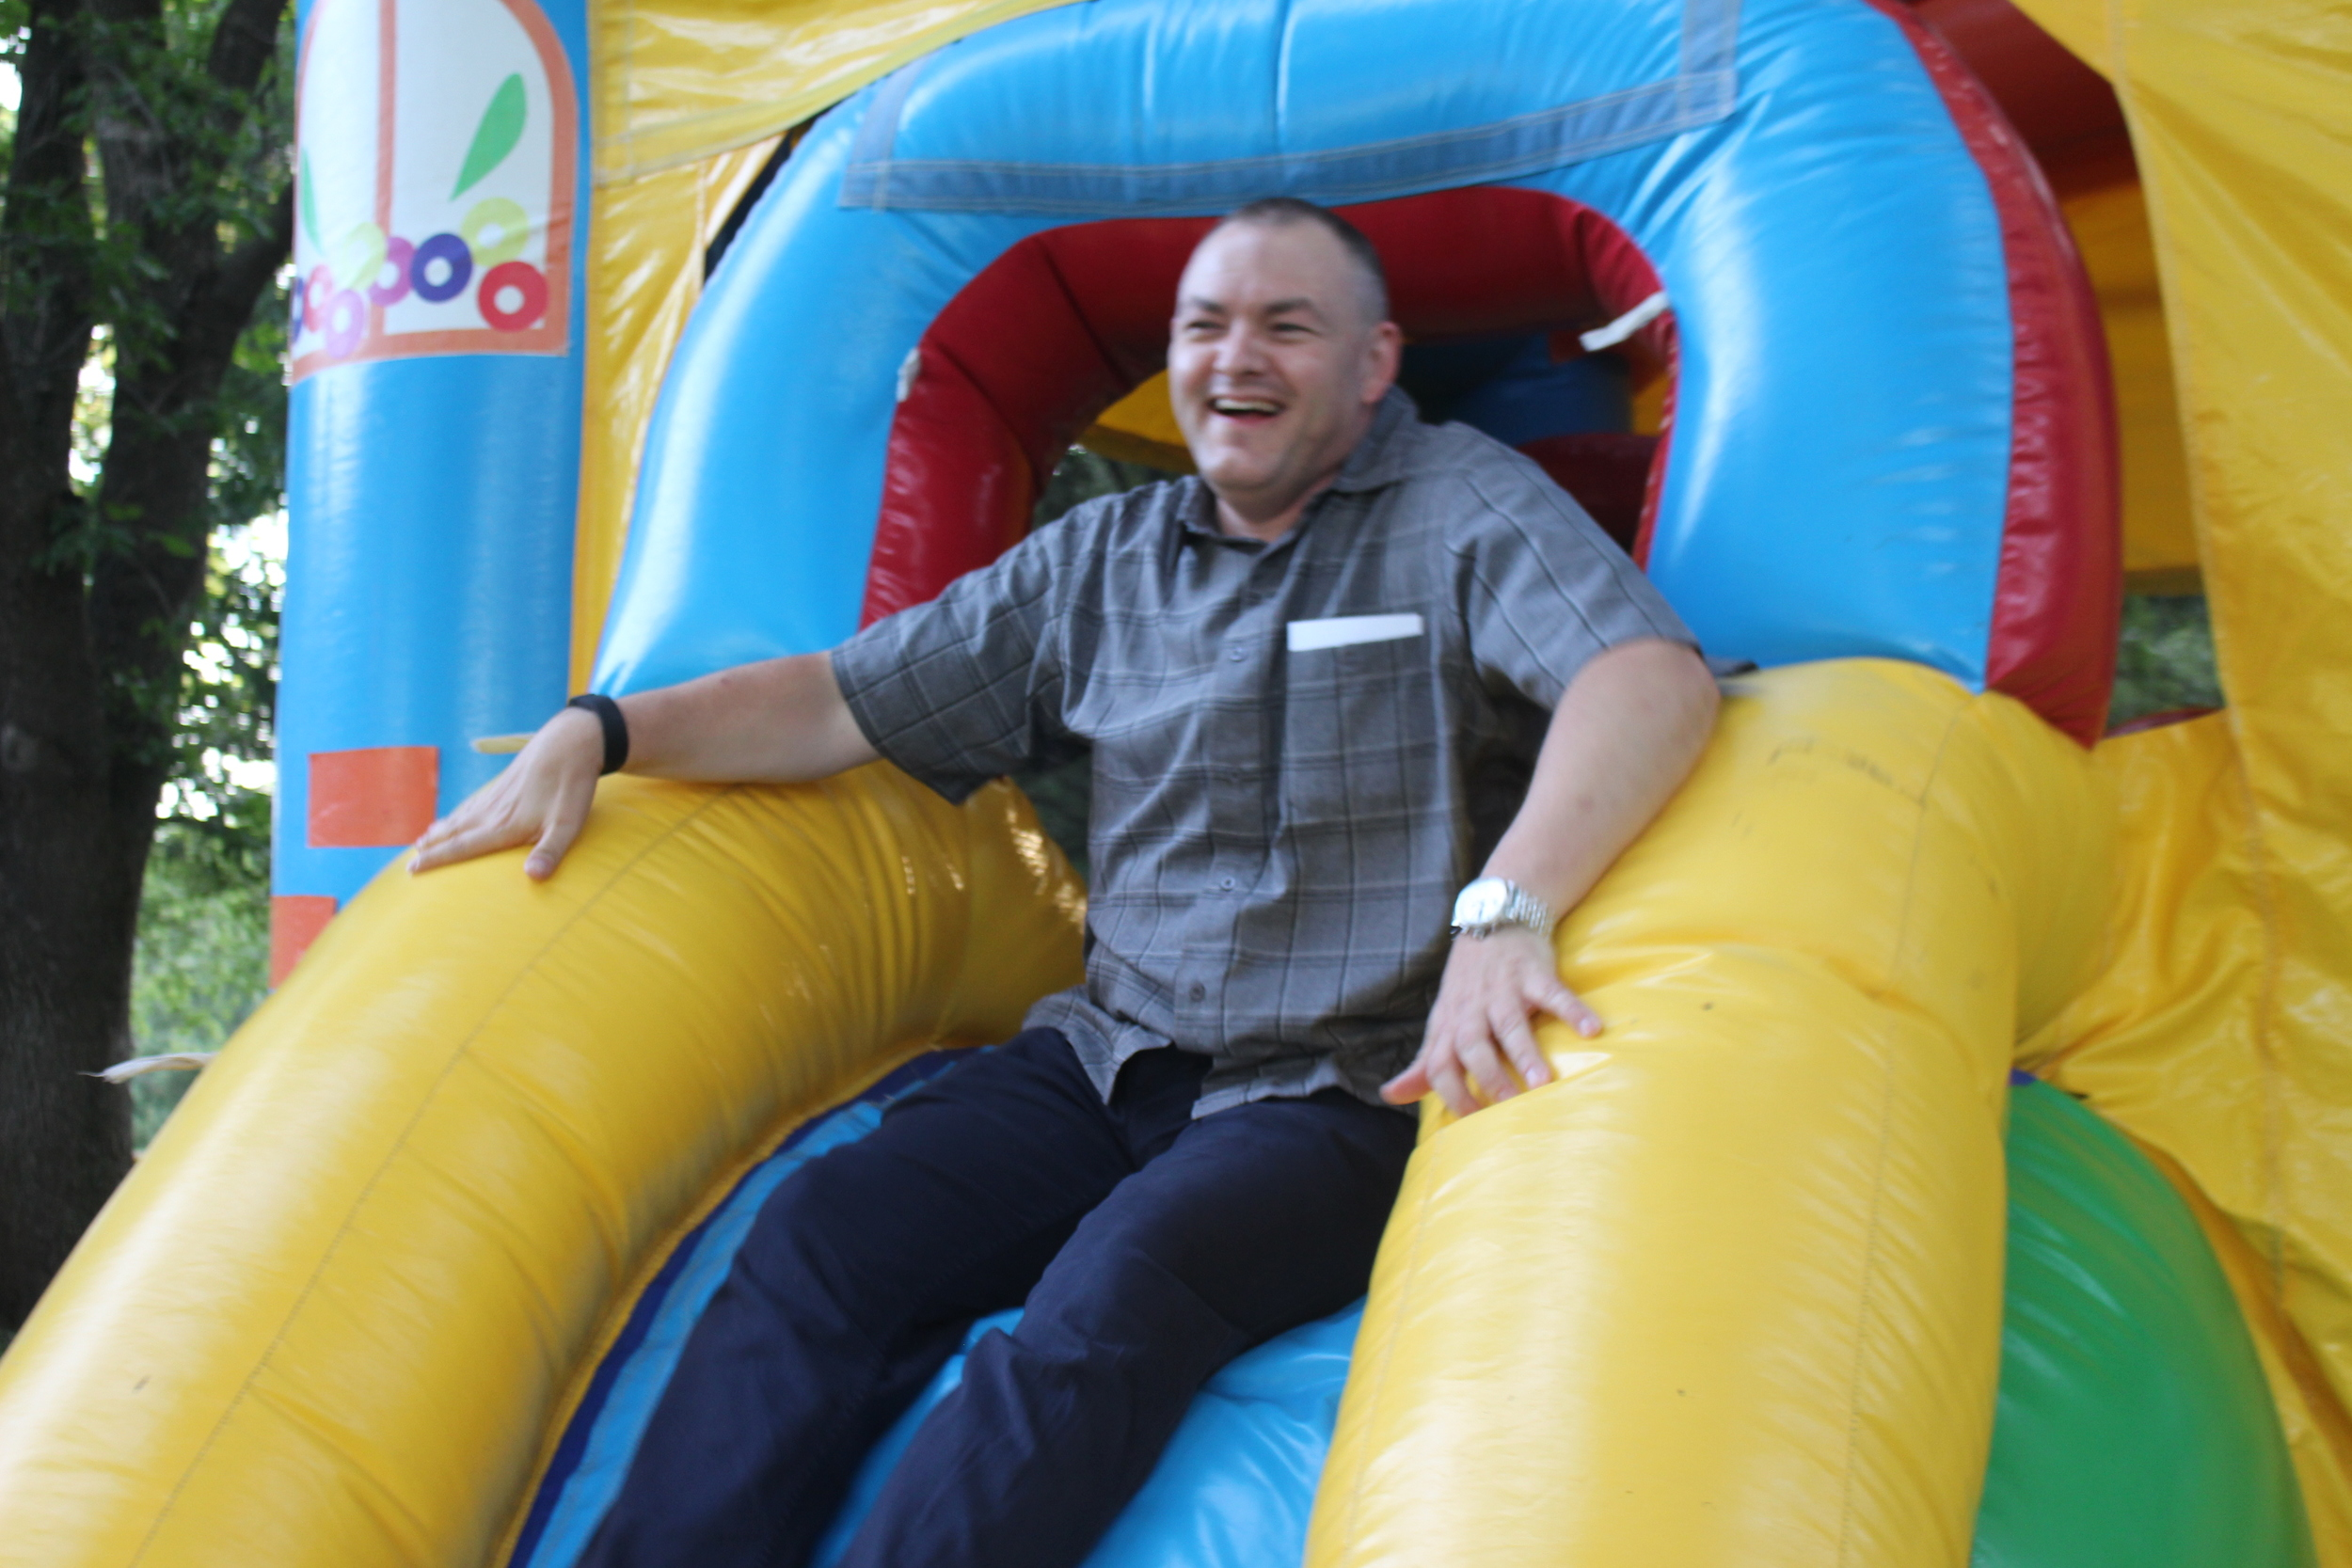 Having Fun in the Bouncy House!